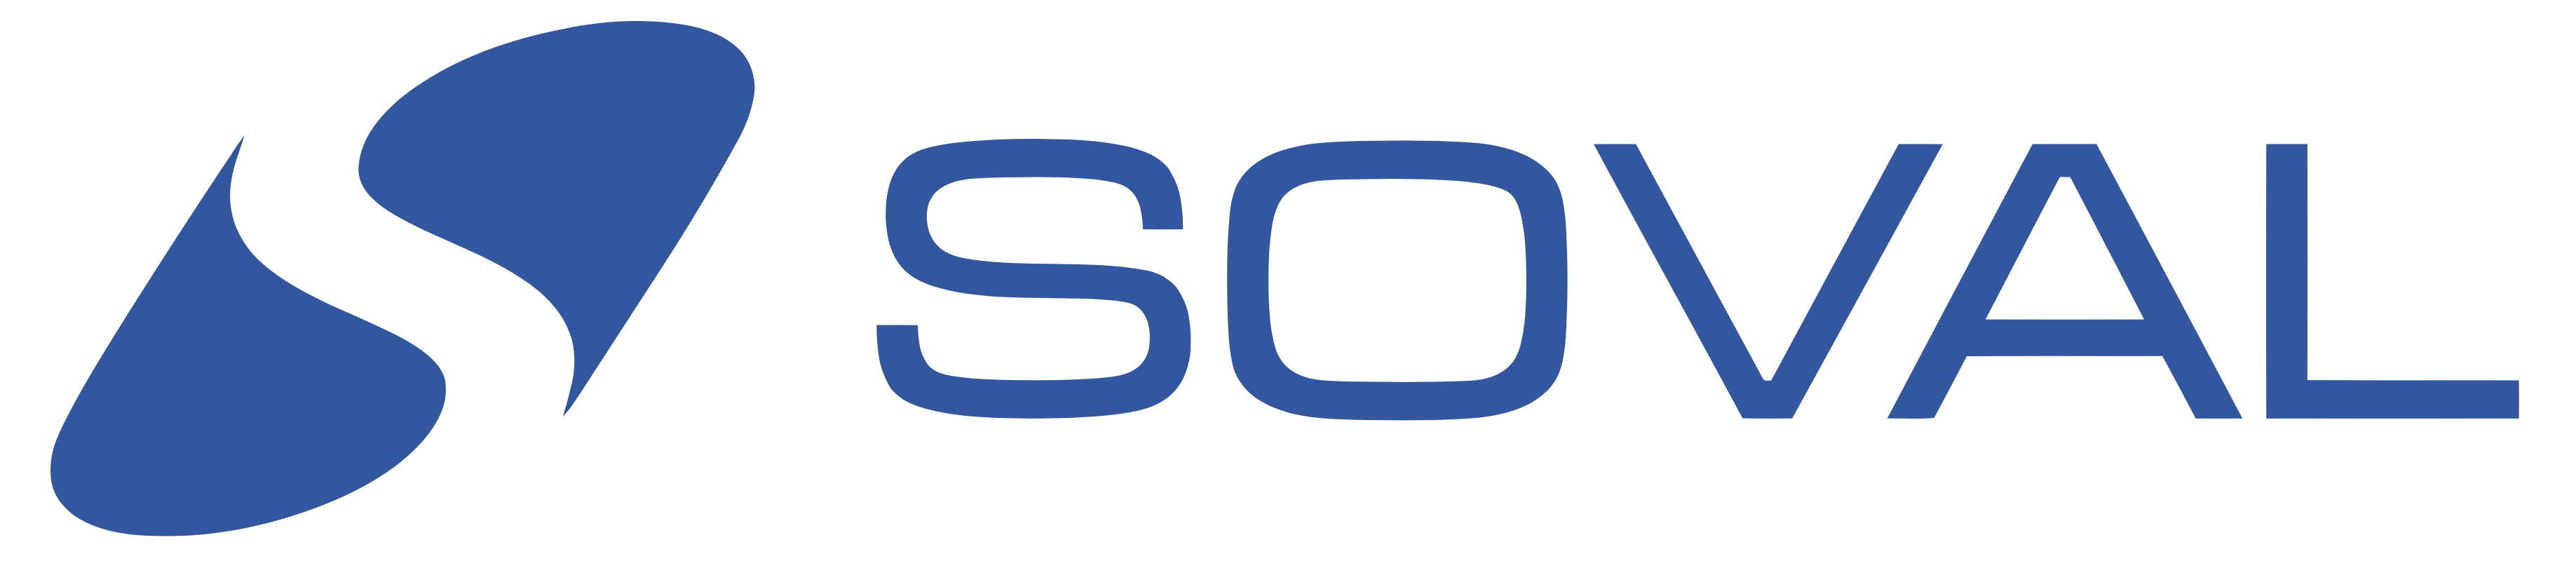 2018 New Logo